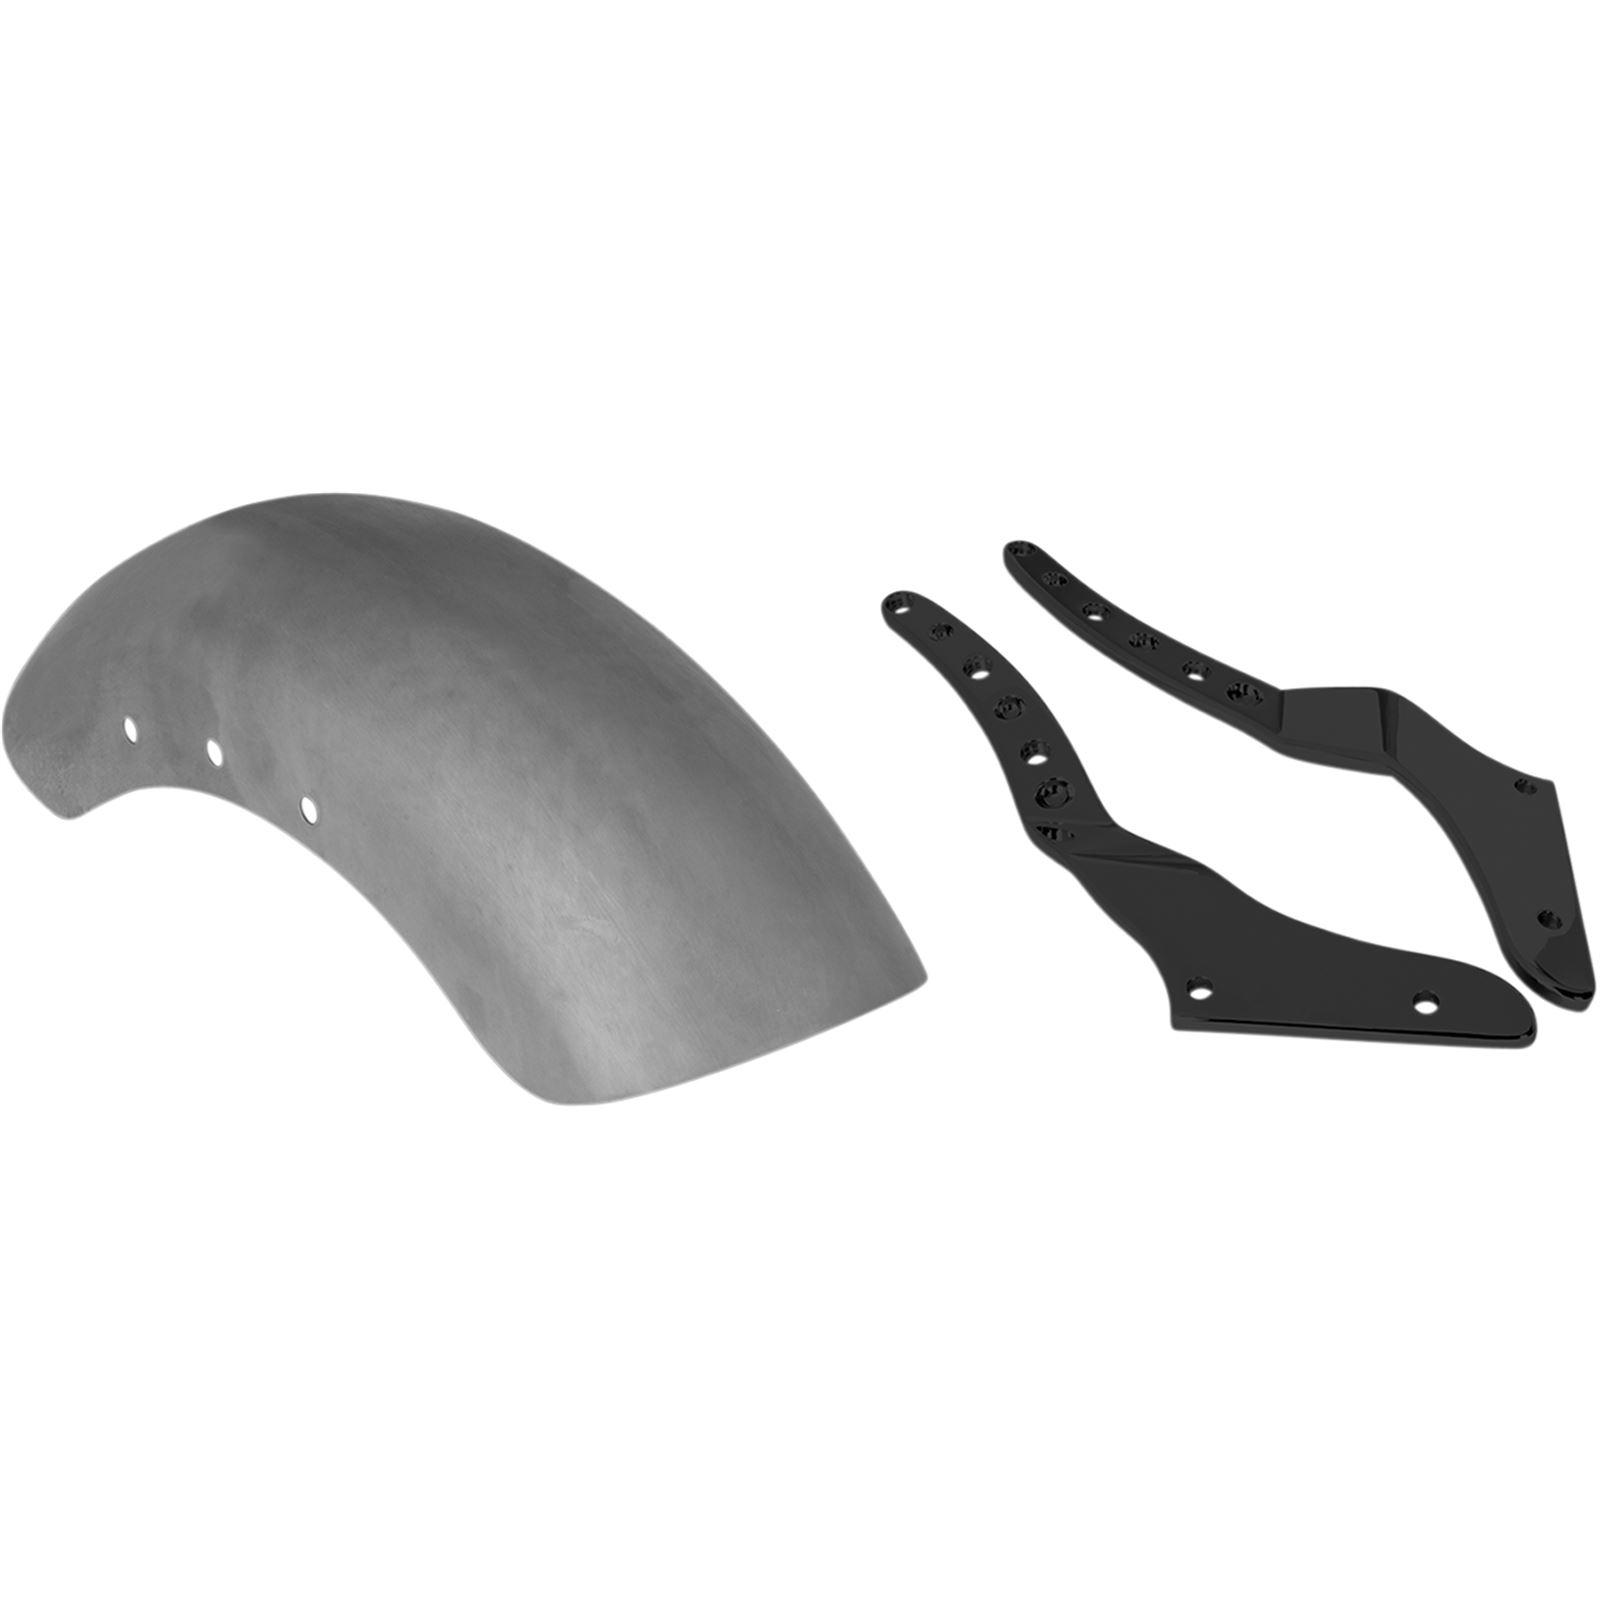 "RSD Tracker Rear Fender Conversion Kit with Black Struts - For 150 mm Rear Tire - 7"" W"